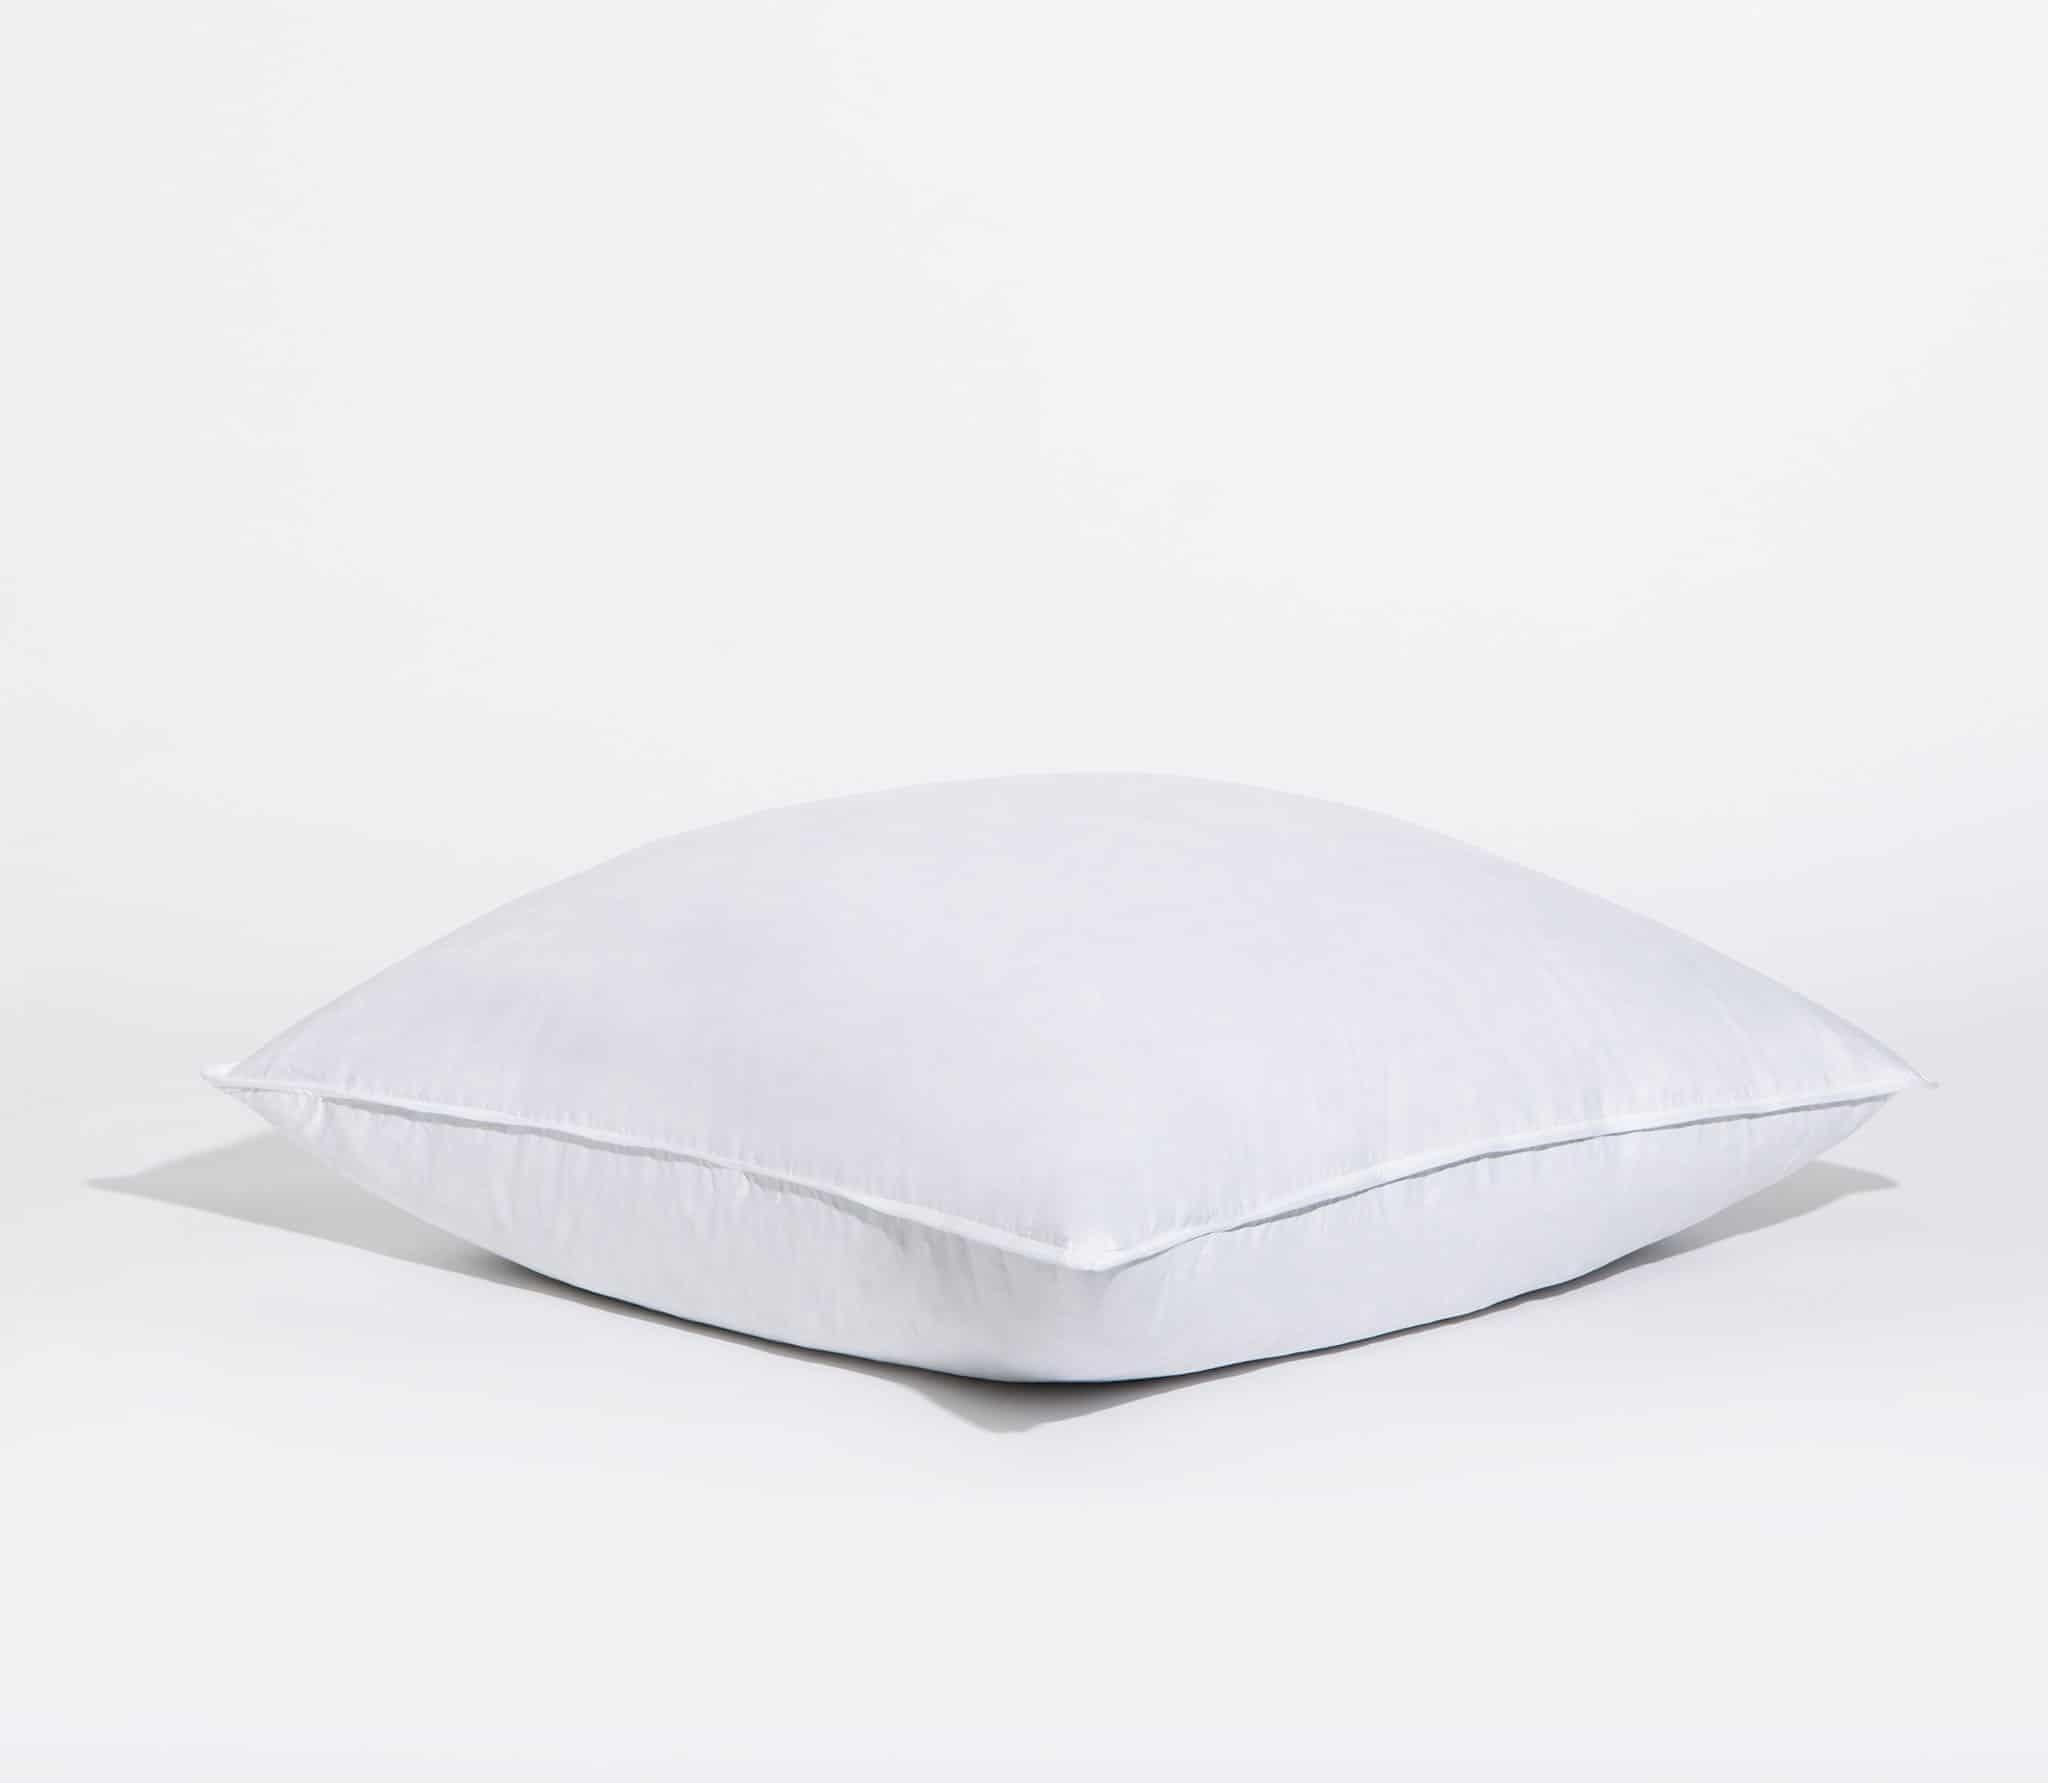 Sleep Studio Inserts 26 9706d53f 1782 4516 be39